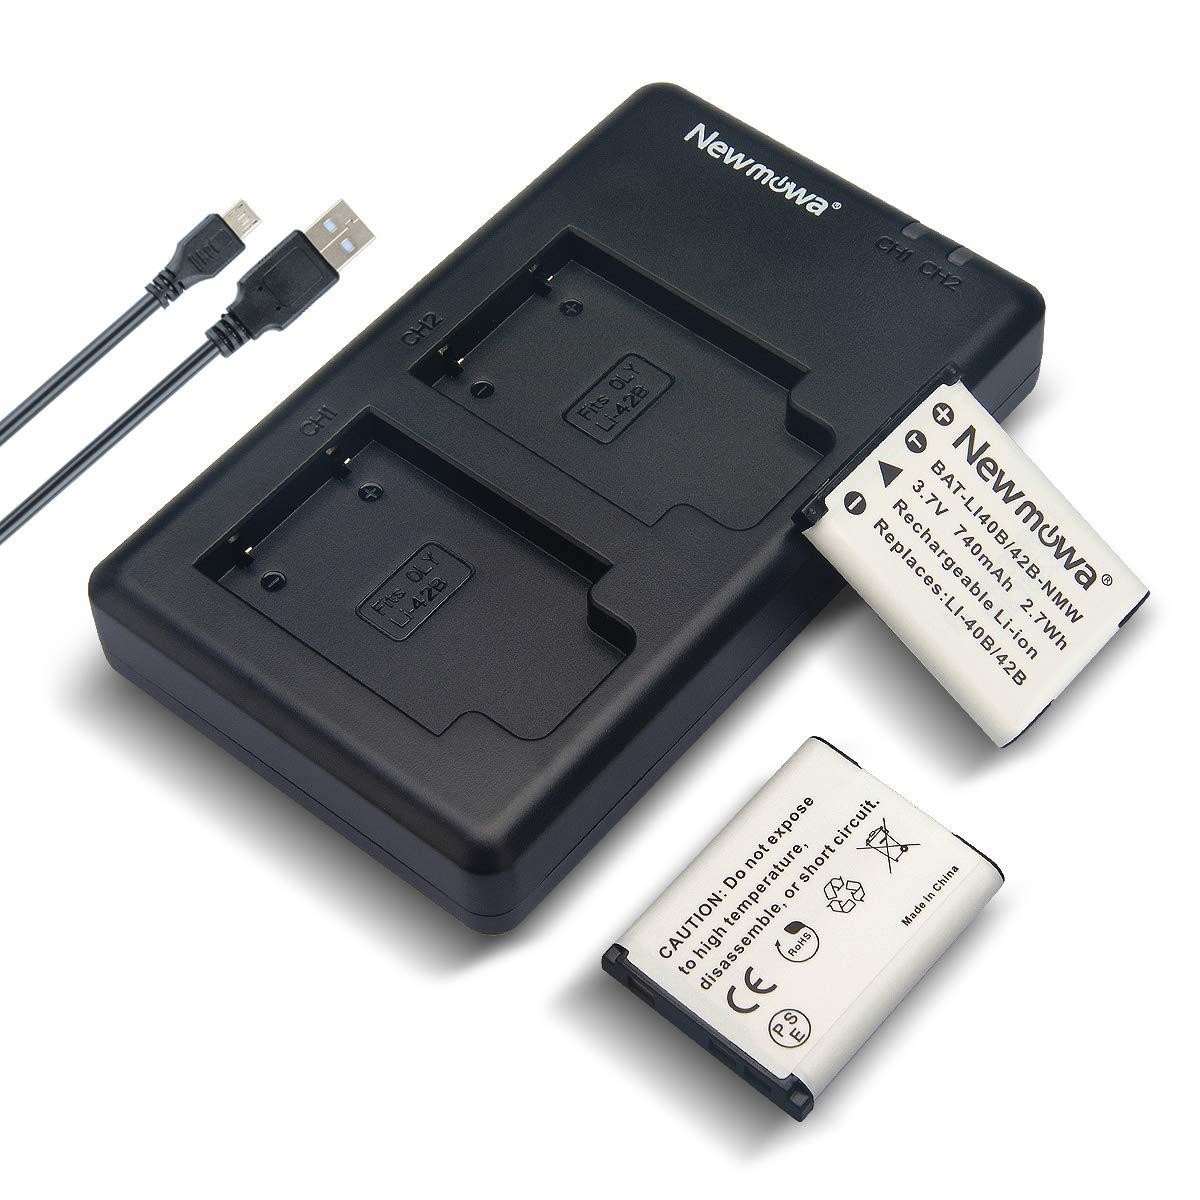 Newmowa Li-42B Battery (2 Pack) and Dual USB Charger Kit for Olympus Li-42B/Li-40B,Fujifilm NP-45S and Olympus Stylus 1040 1050W 1060 1070 1200 7000 7010 7020 7030 7040 Tough 3000 TG-310 TG-320 VR310 by Newmowa